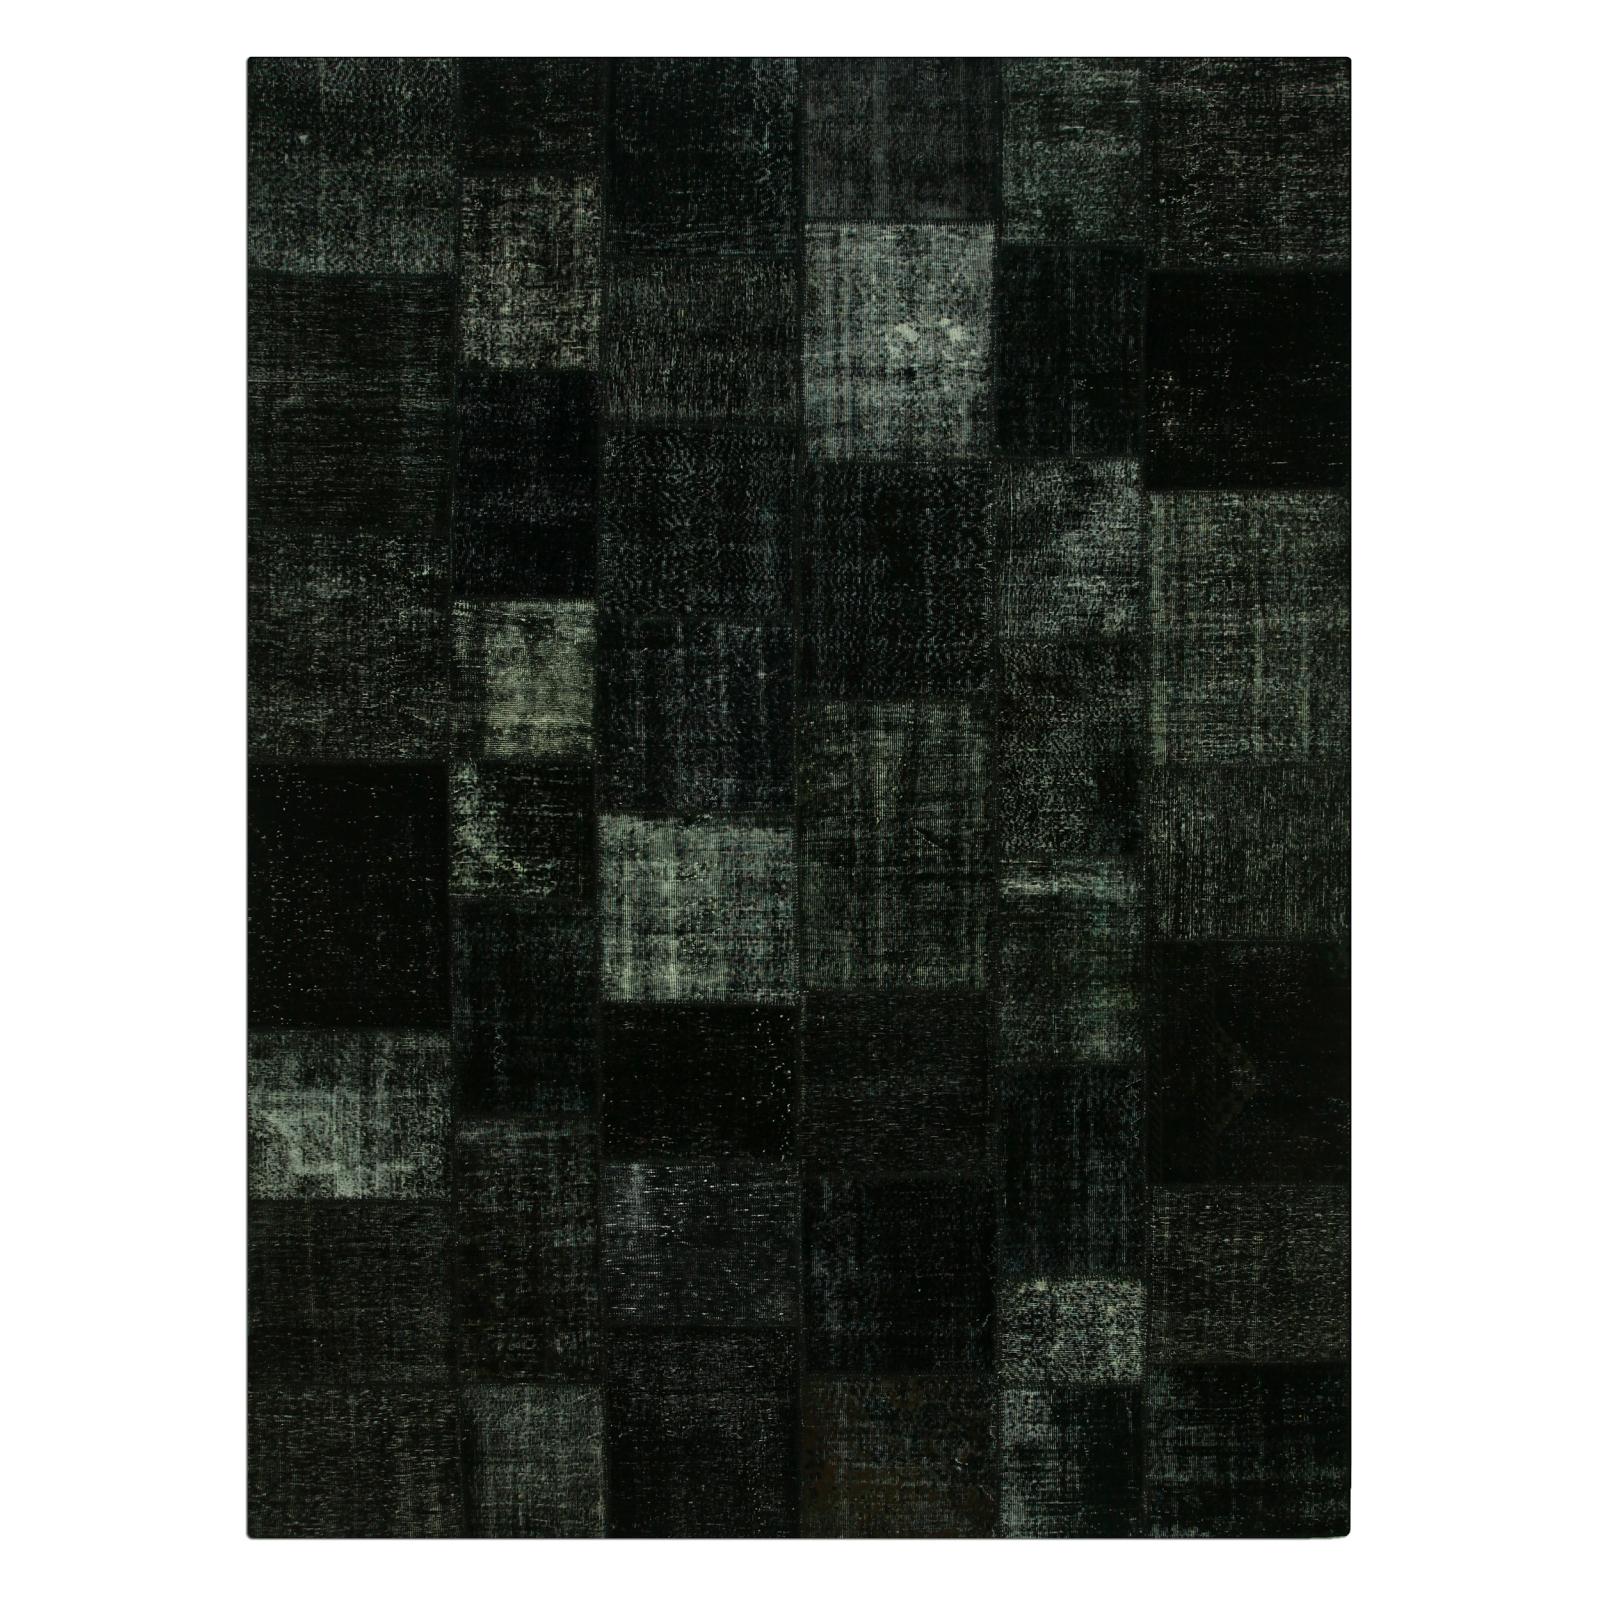 Tapete Patchwork Vintage : Home > Tapetes vintage > Patchwork rugs > Patchwork